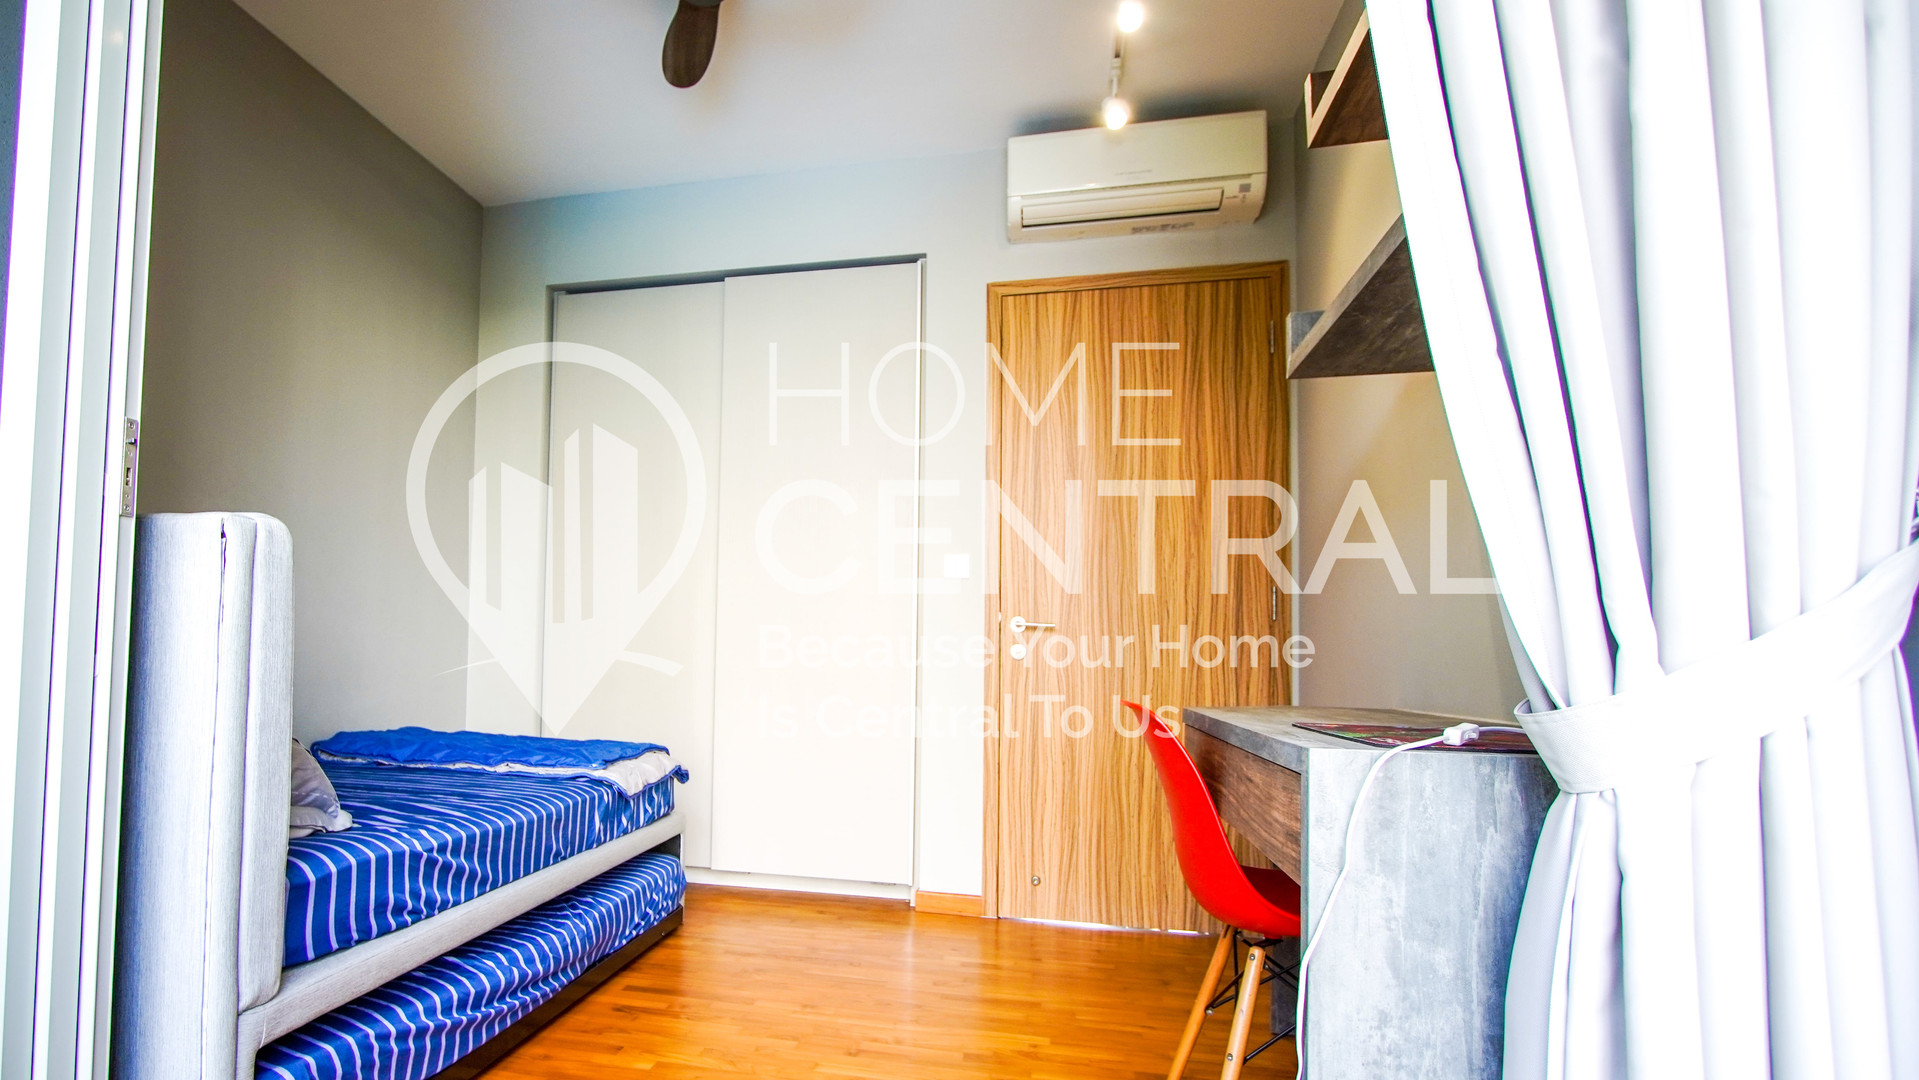 14 Bedroom 1-1 DSC02155-HDR-min.jpg